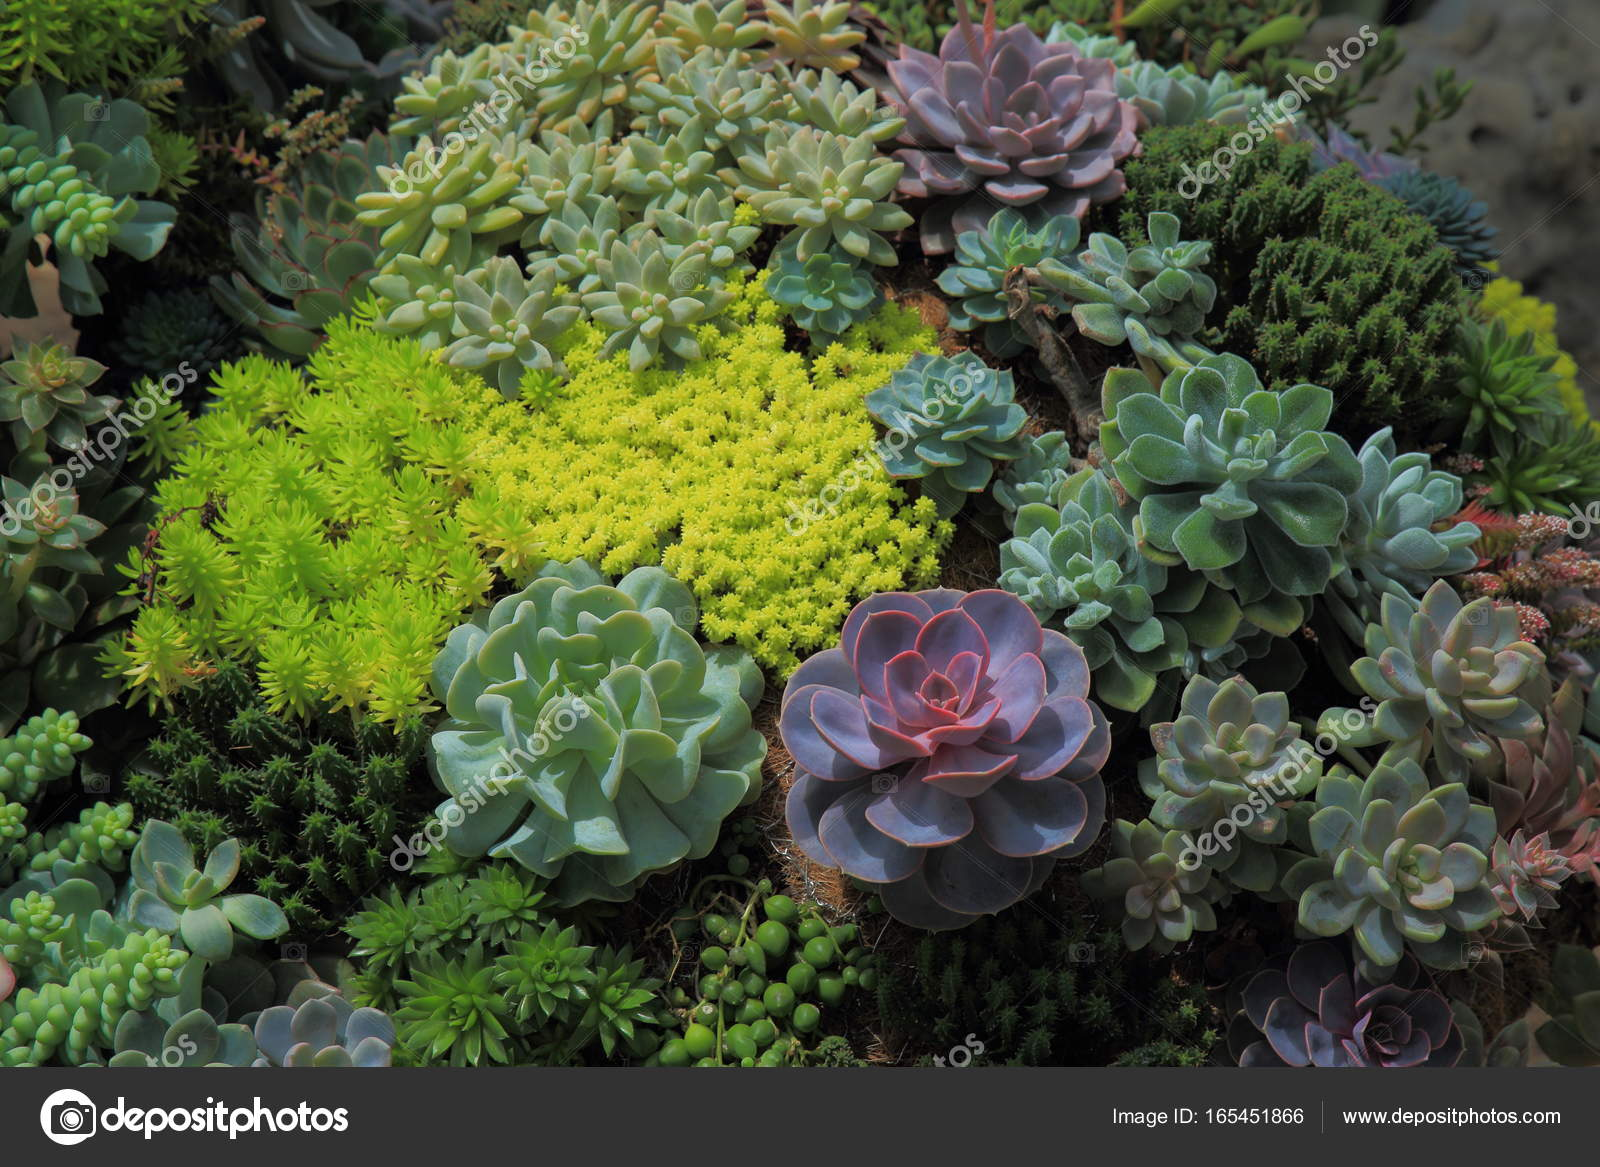 Jardin Miniature Avec Plante Succulente Violet Parmi De Luxuriantes